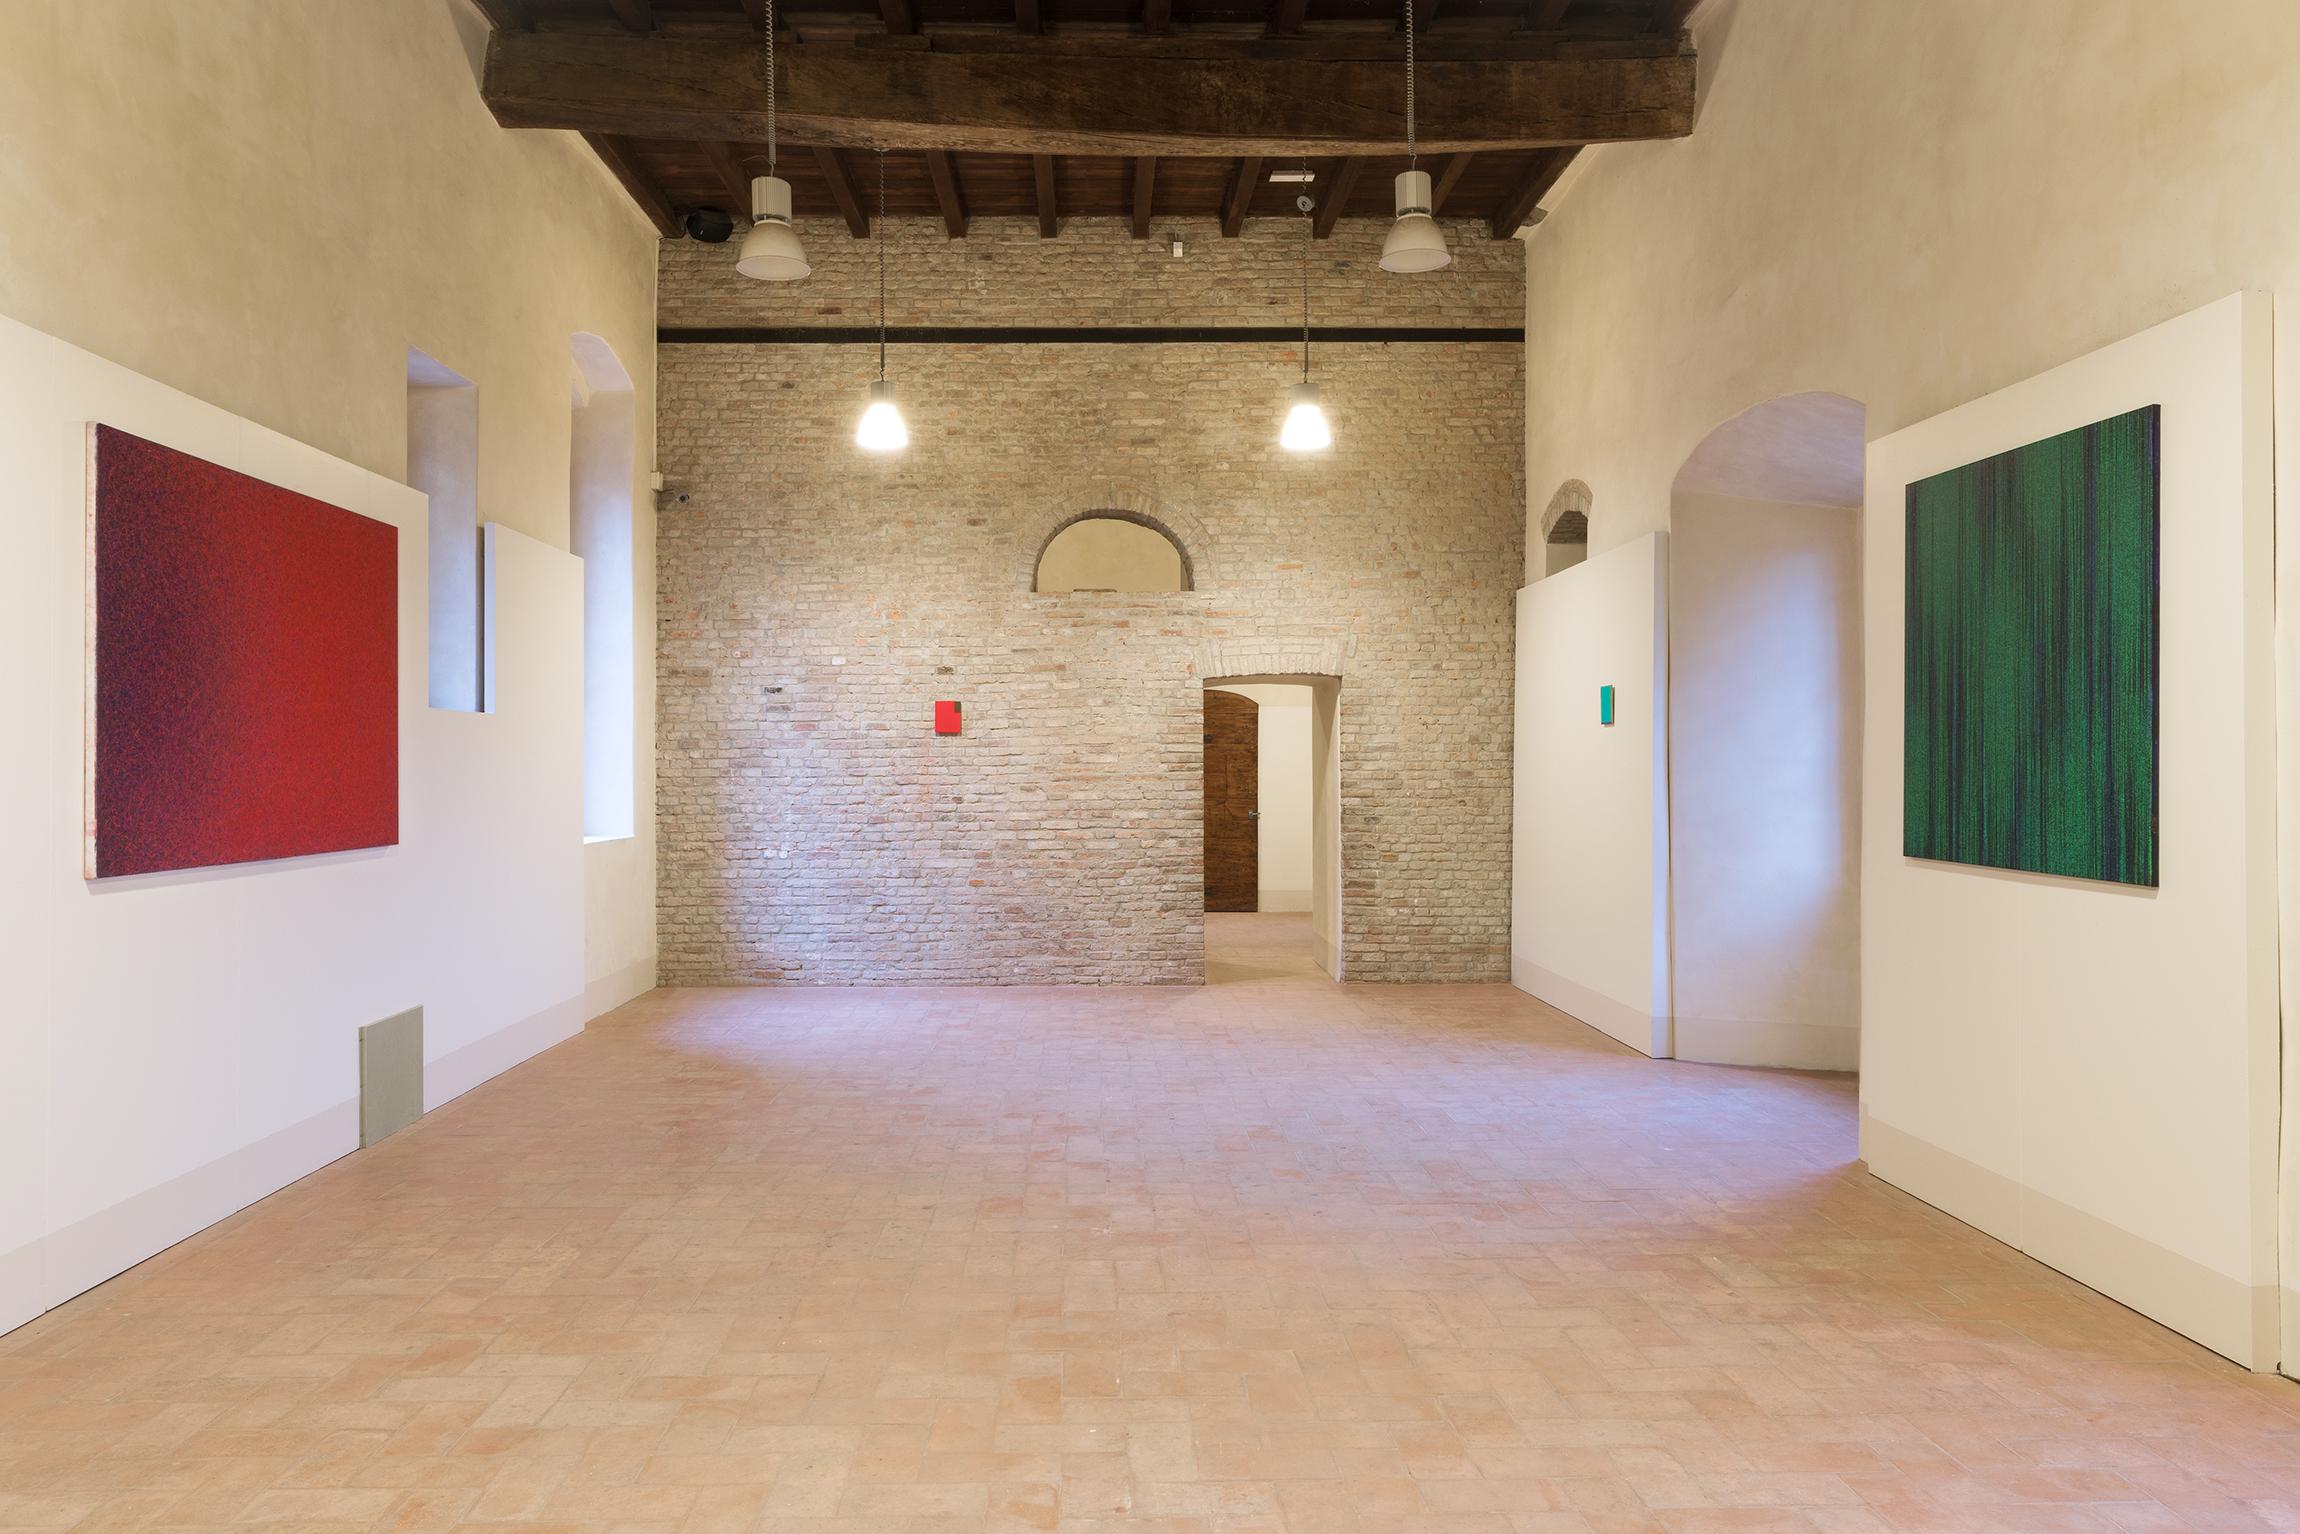 3. Luca Macauda - Ciane - vista della mostra - 2018